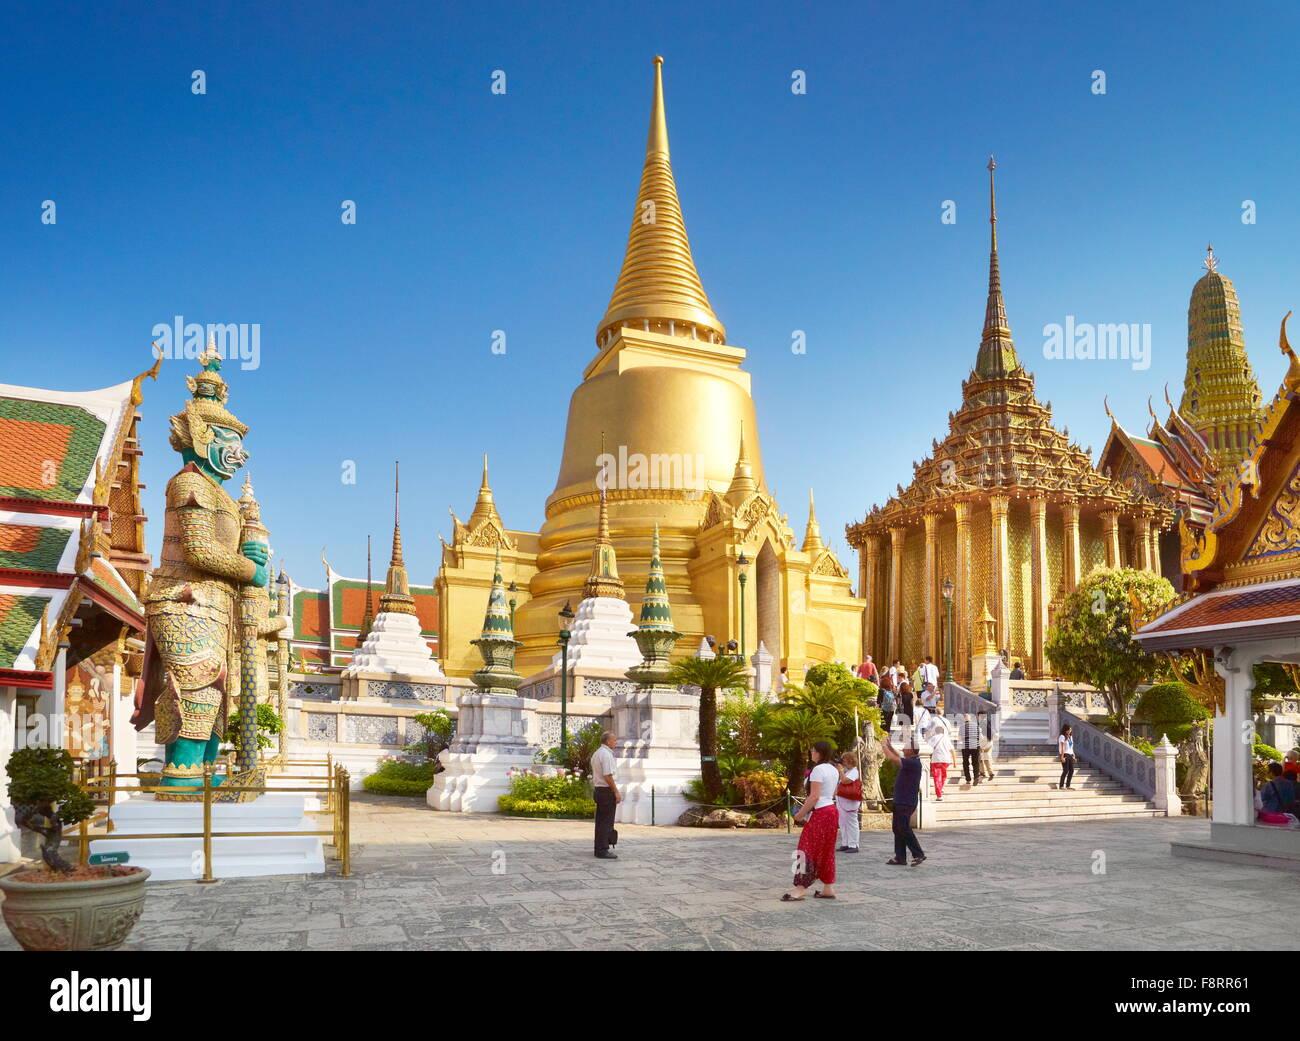 Thaïlande - Bangkok, Le Grand Palais Royal, le Wat Phra Kaeo, chedi doré Photo Stock